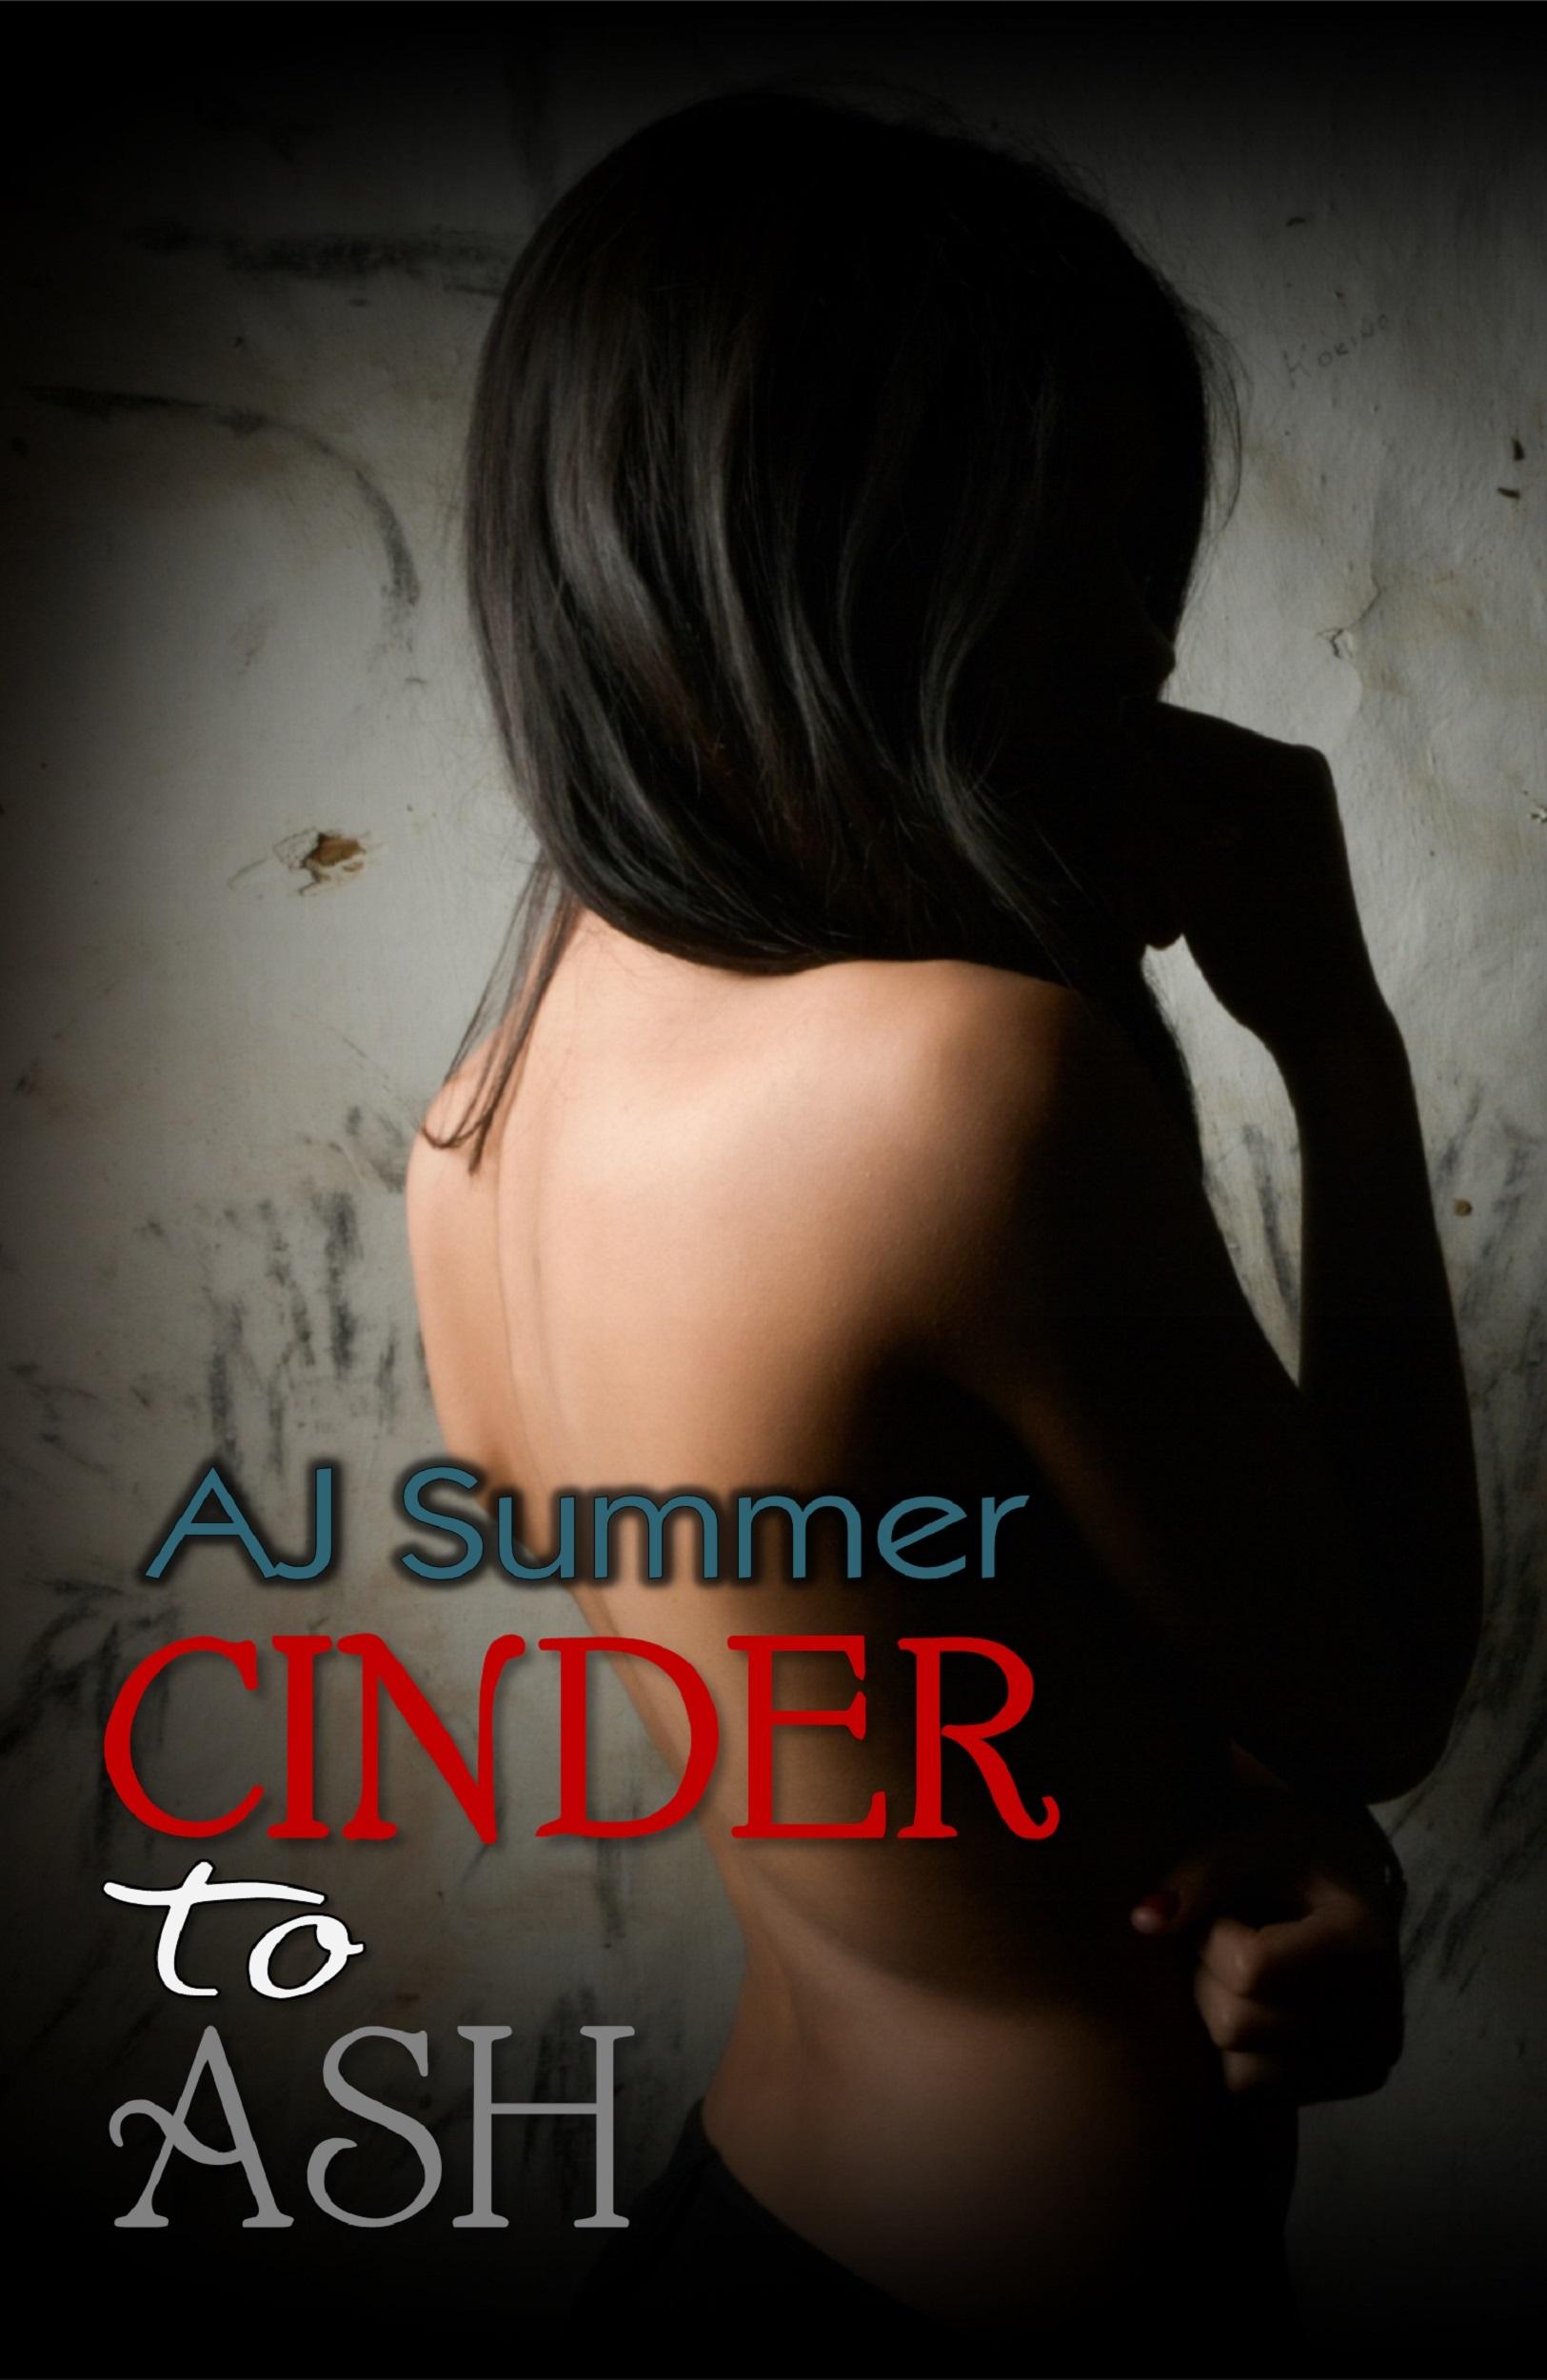 Cinder to Ash